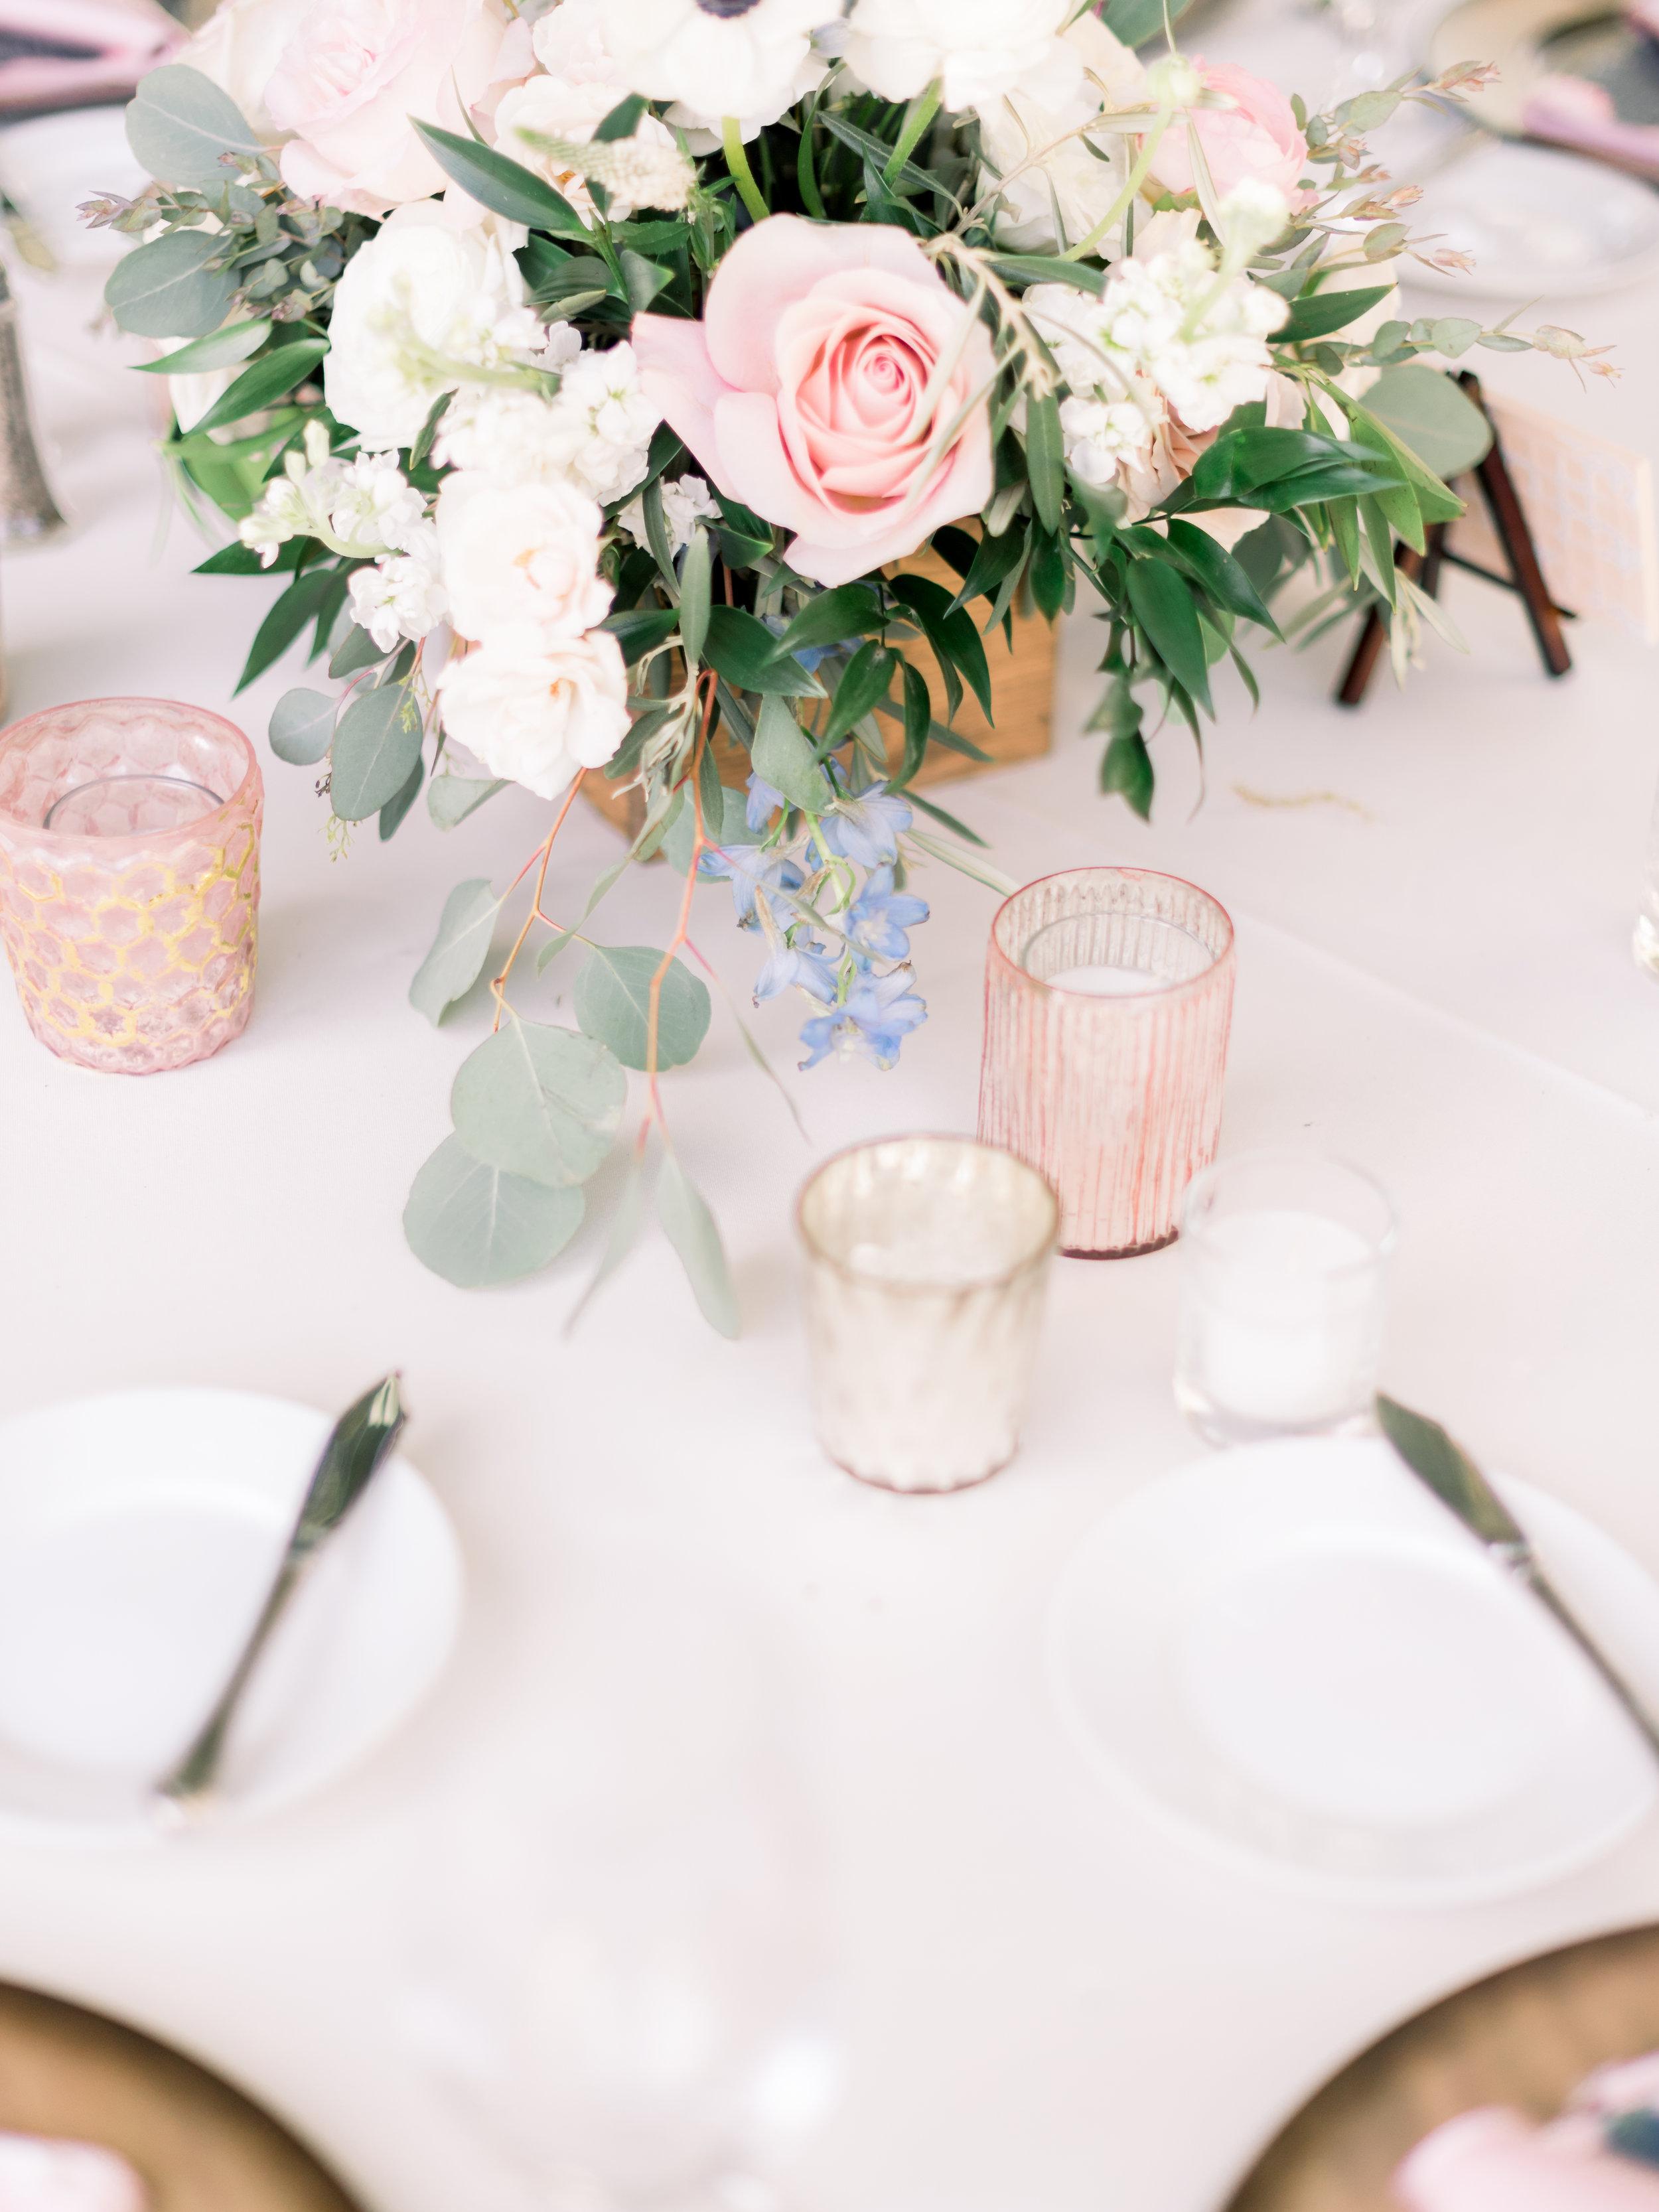 wedding-reception-table-with-pastel-decor.jpg